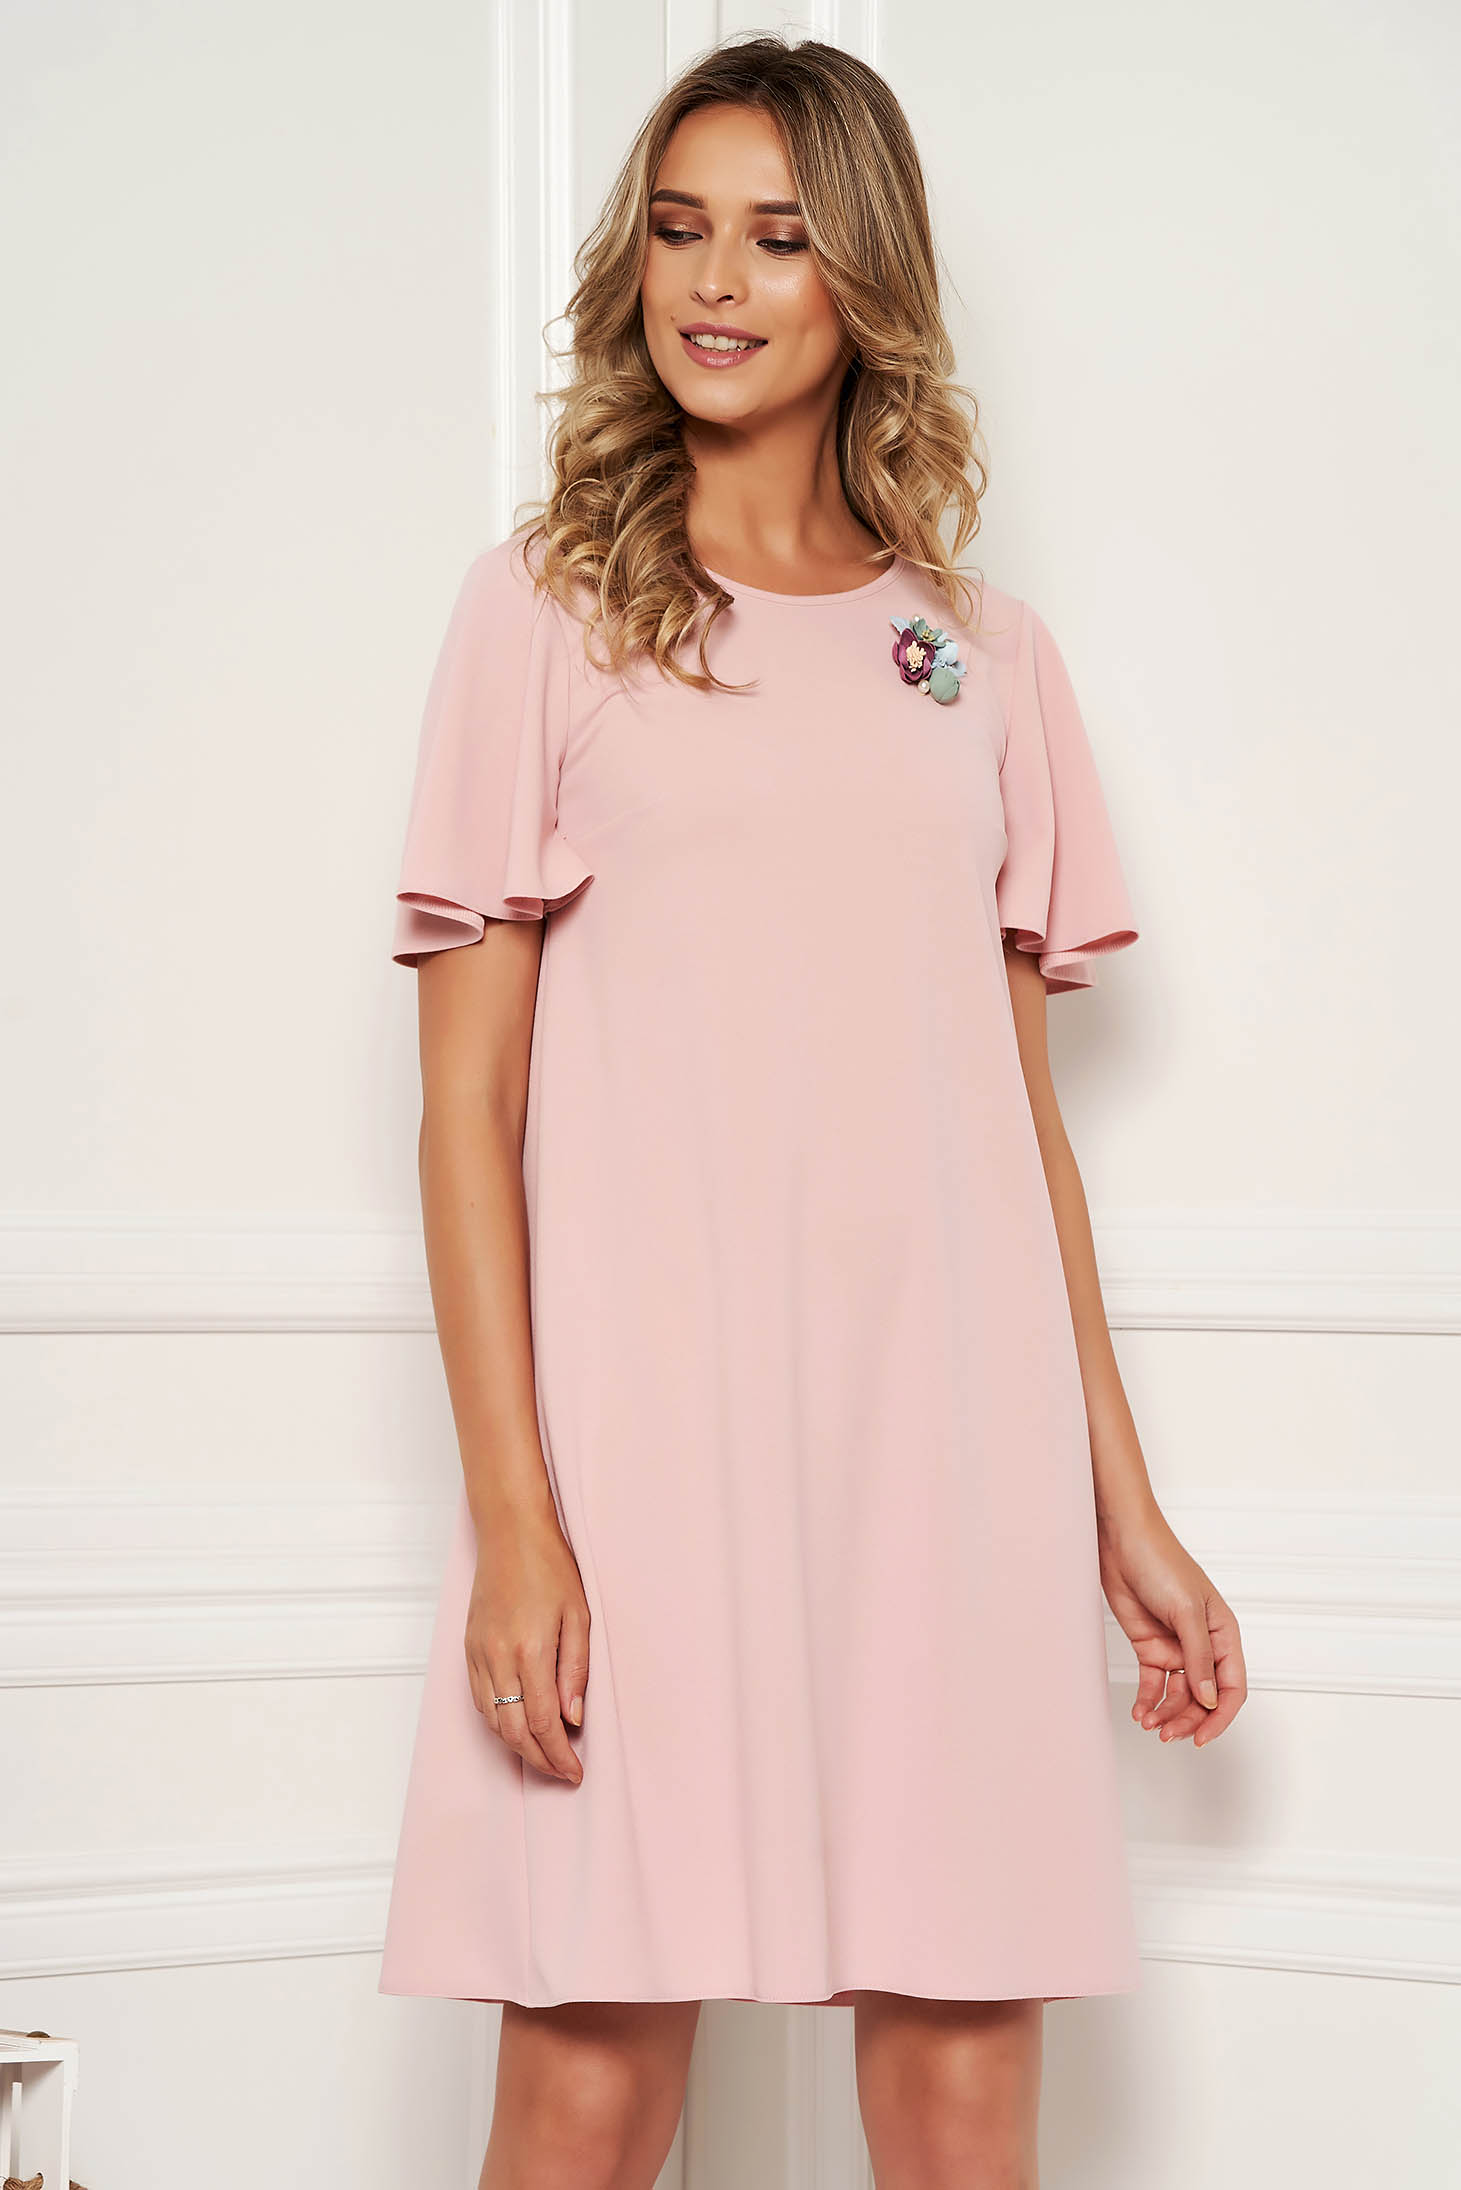 Rochie StarShinerS roz deschis eleganta de zi cu maneci tip fluture accesorizata cu brosa